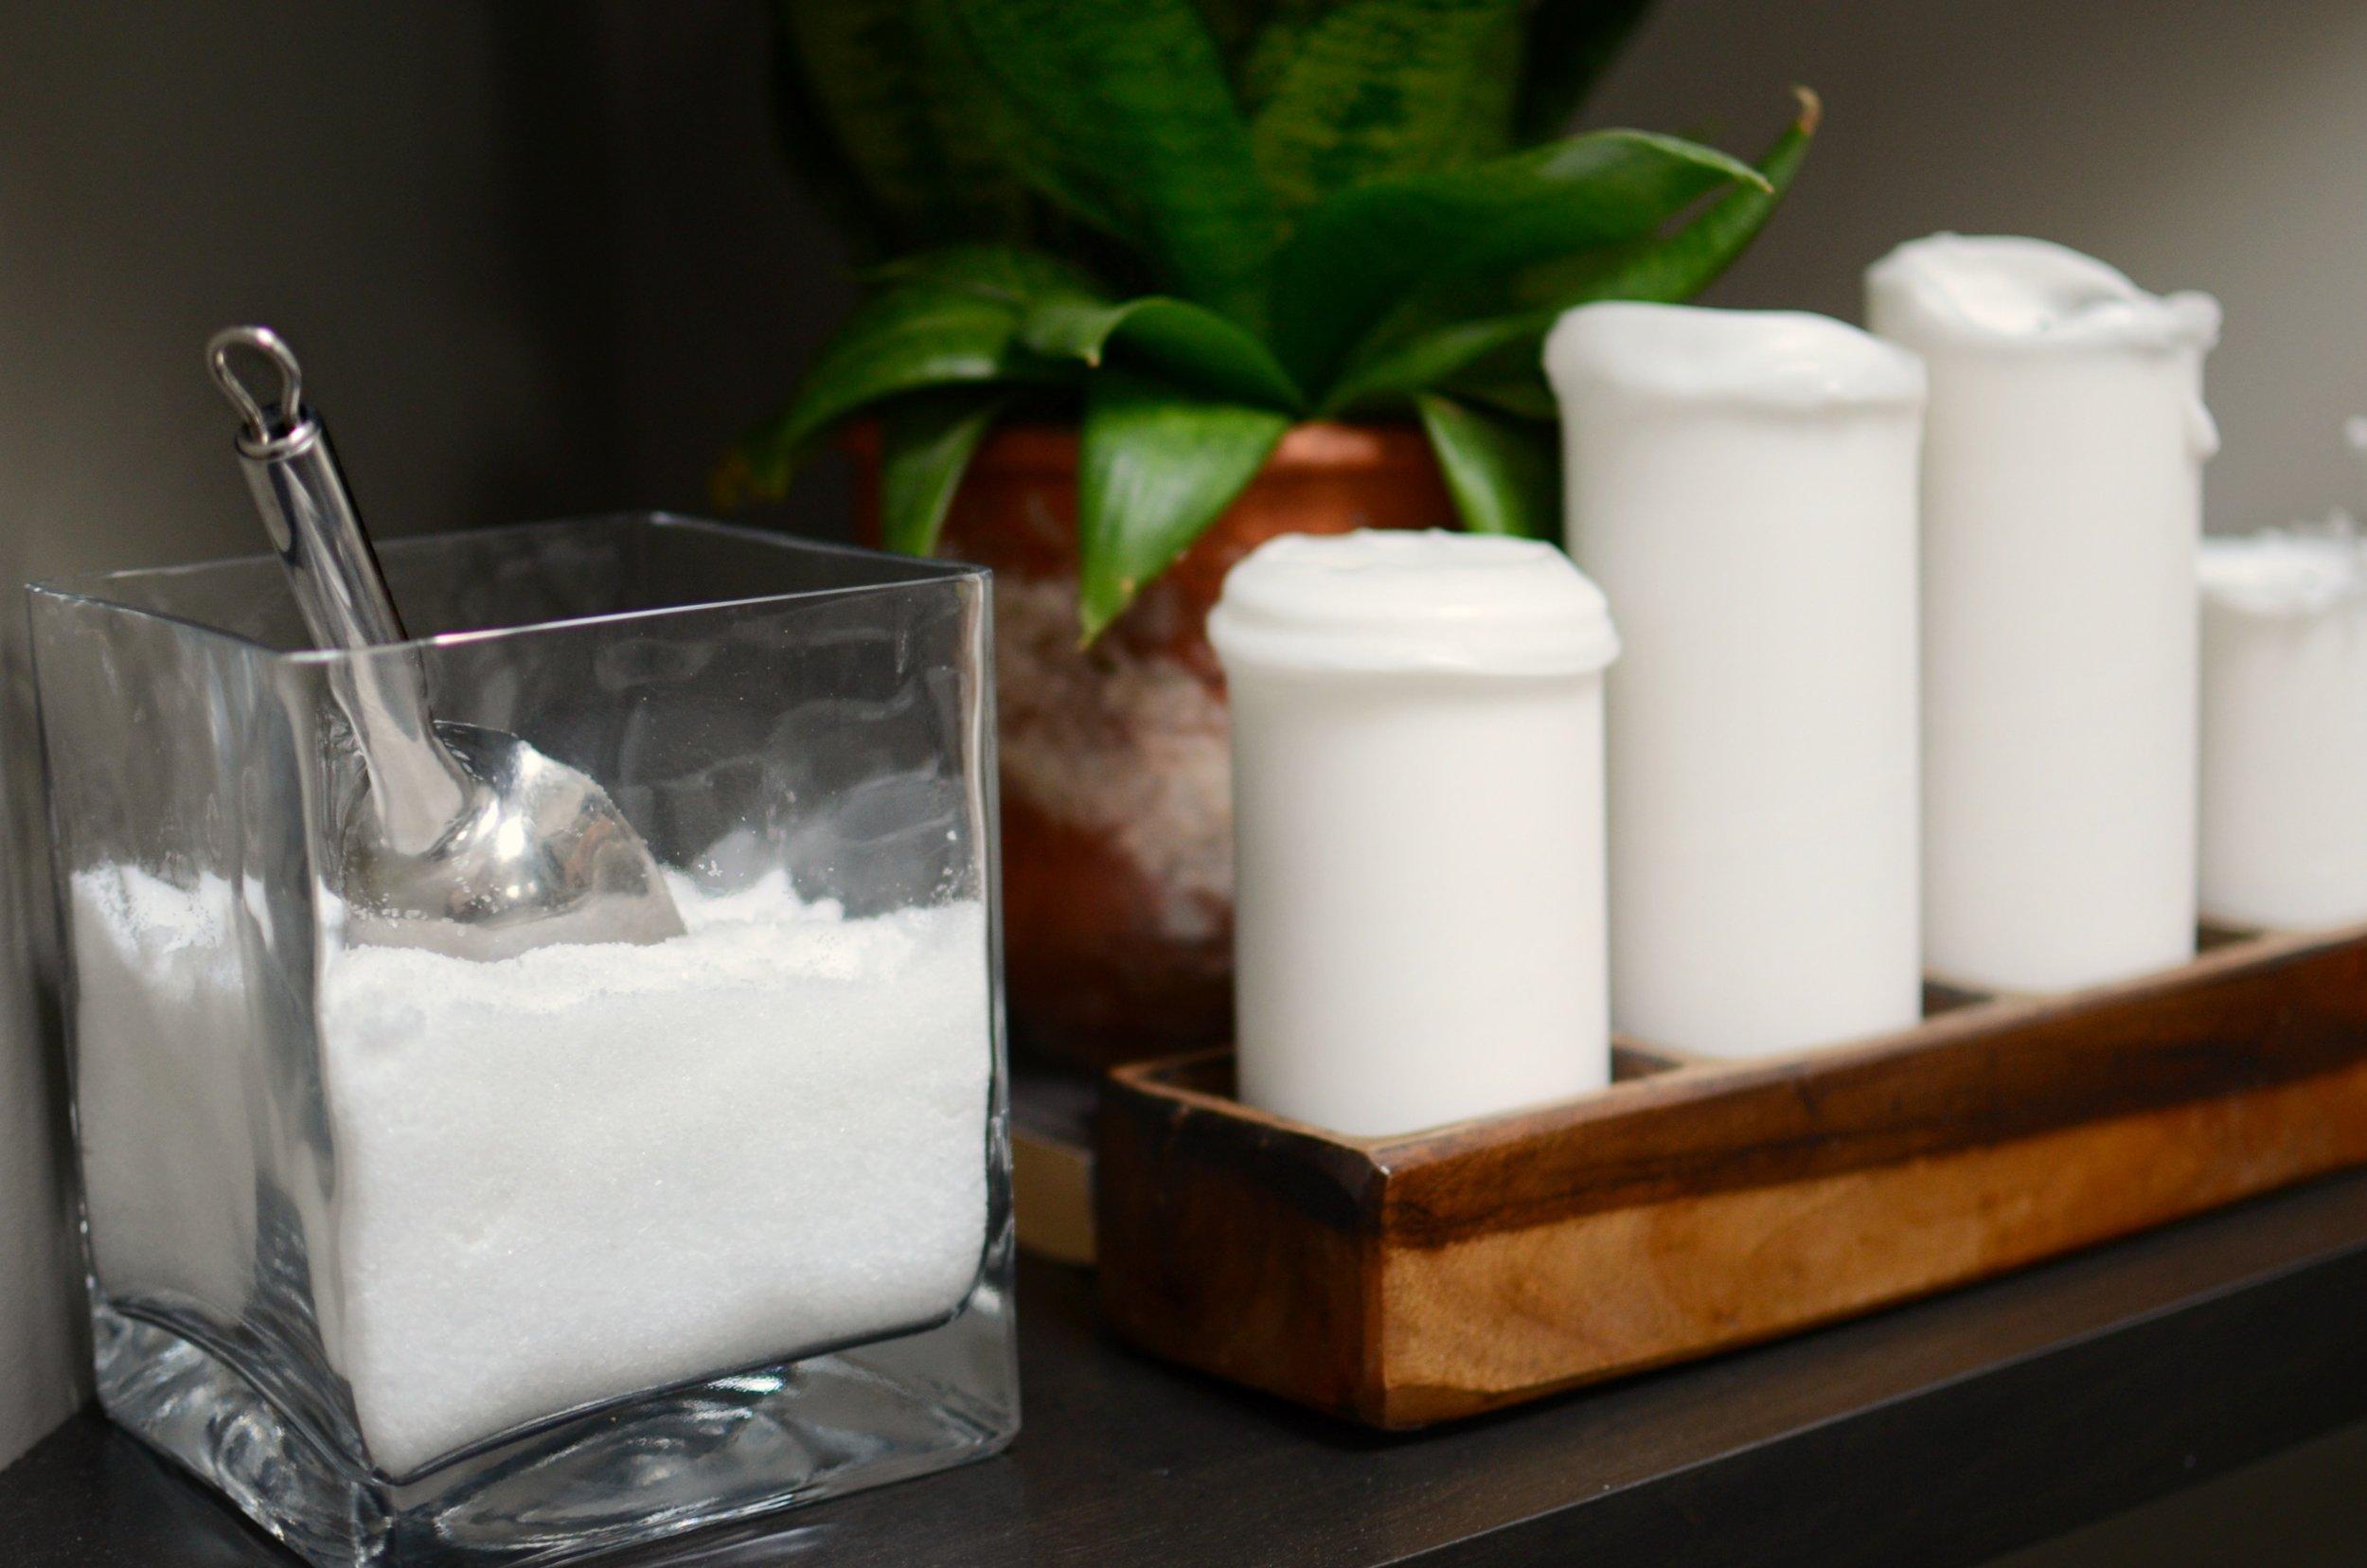 Calgary Interior Designer - Master Bathroom Renovation | 5 Easy steps to adding the finishing touches